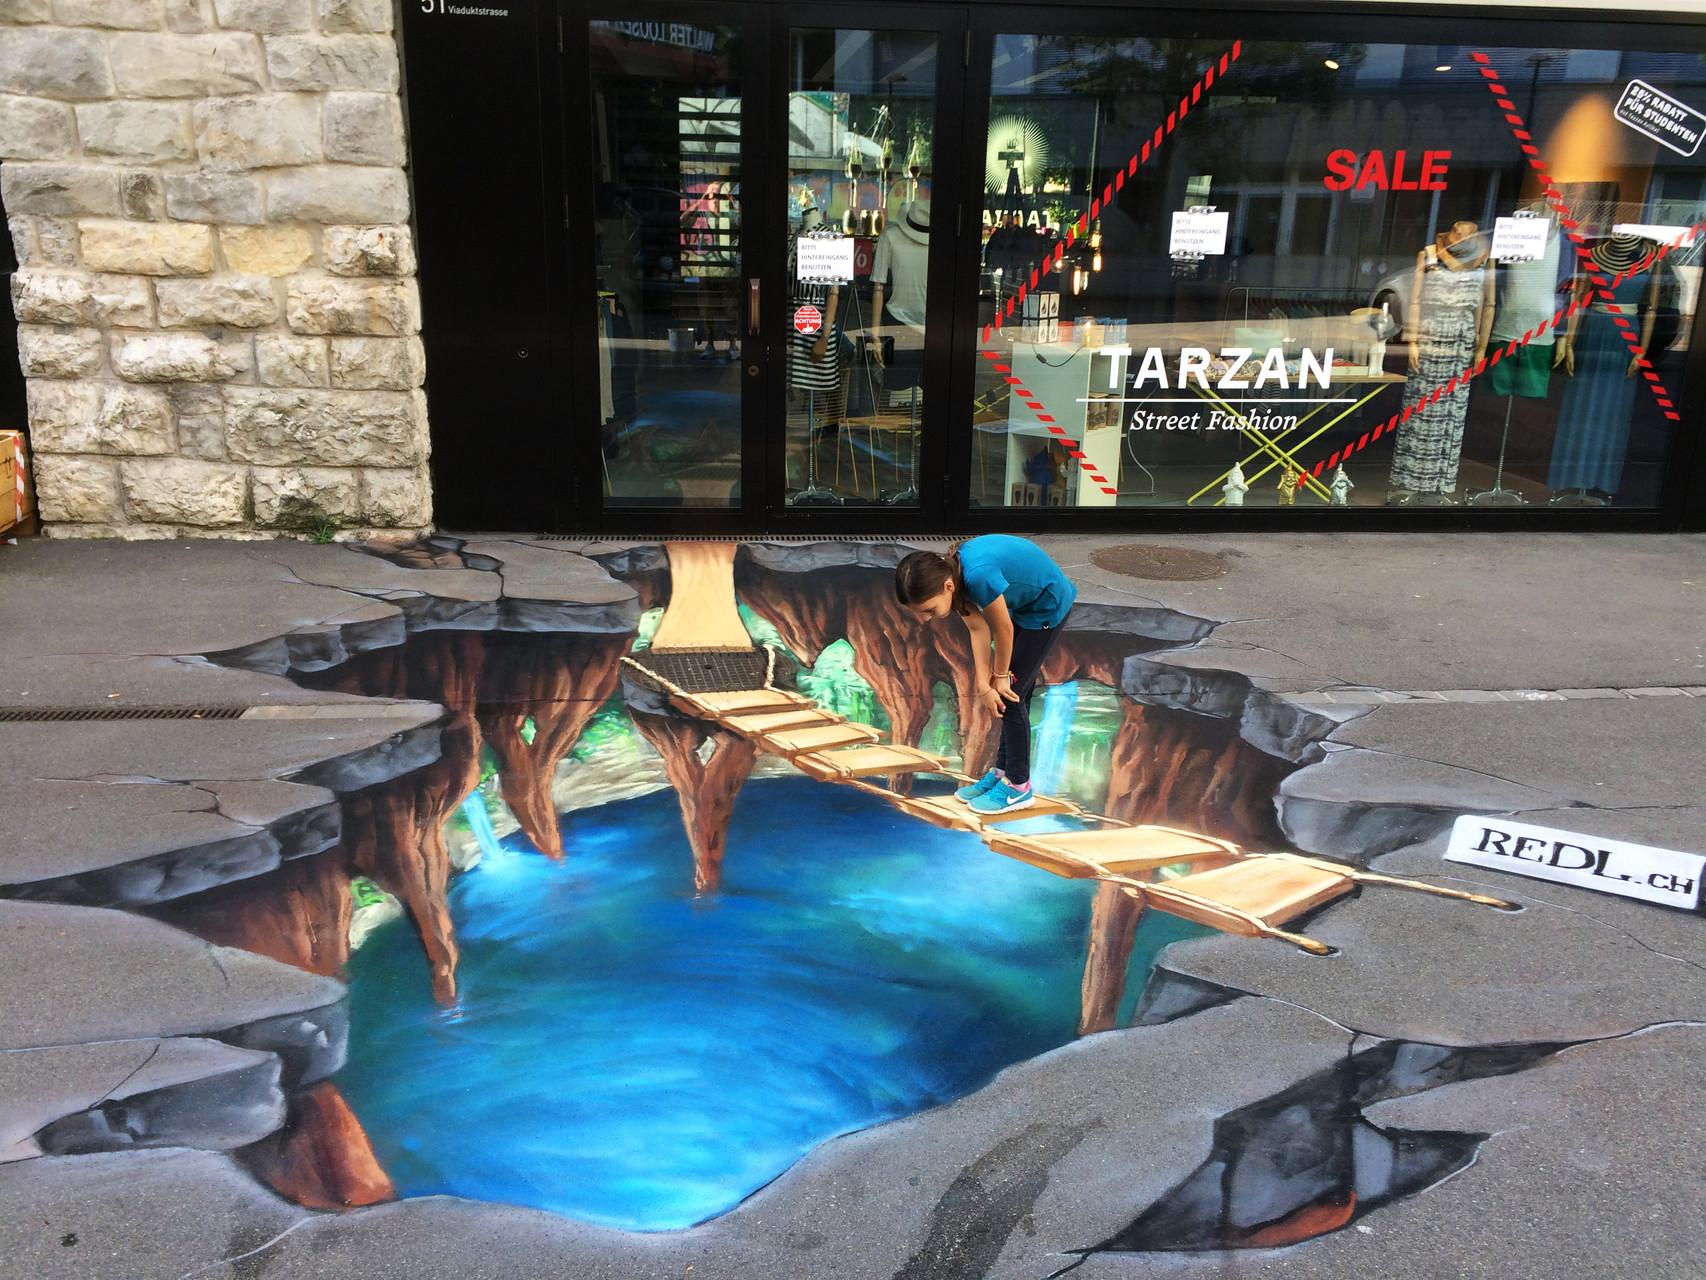 3-D Floorpainting:  Für Tarzan Shop Zürich.